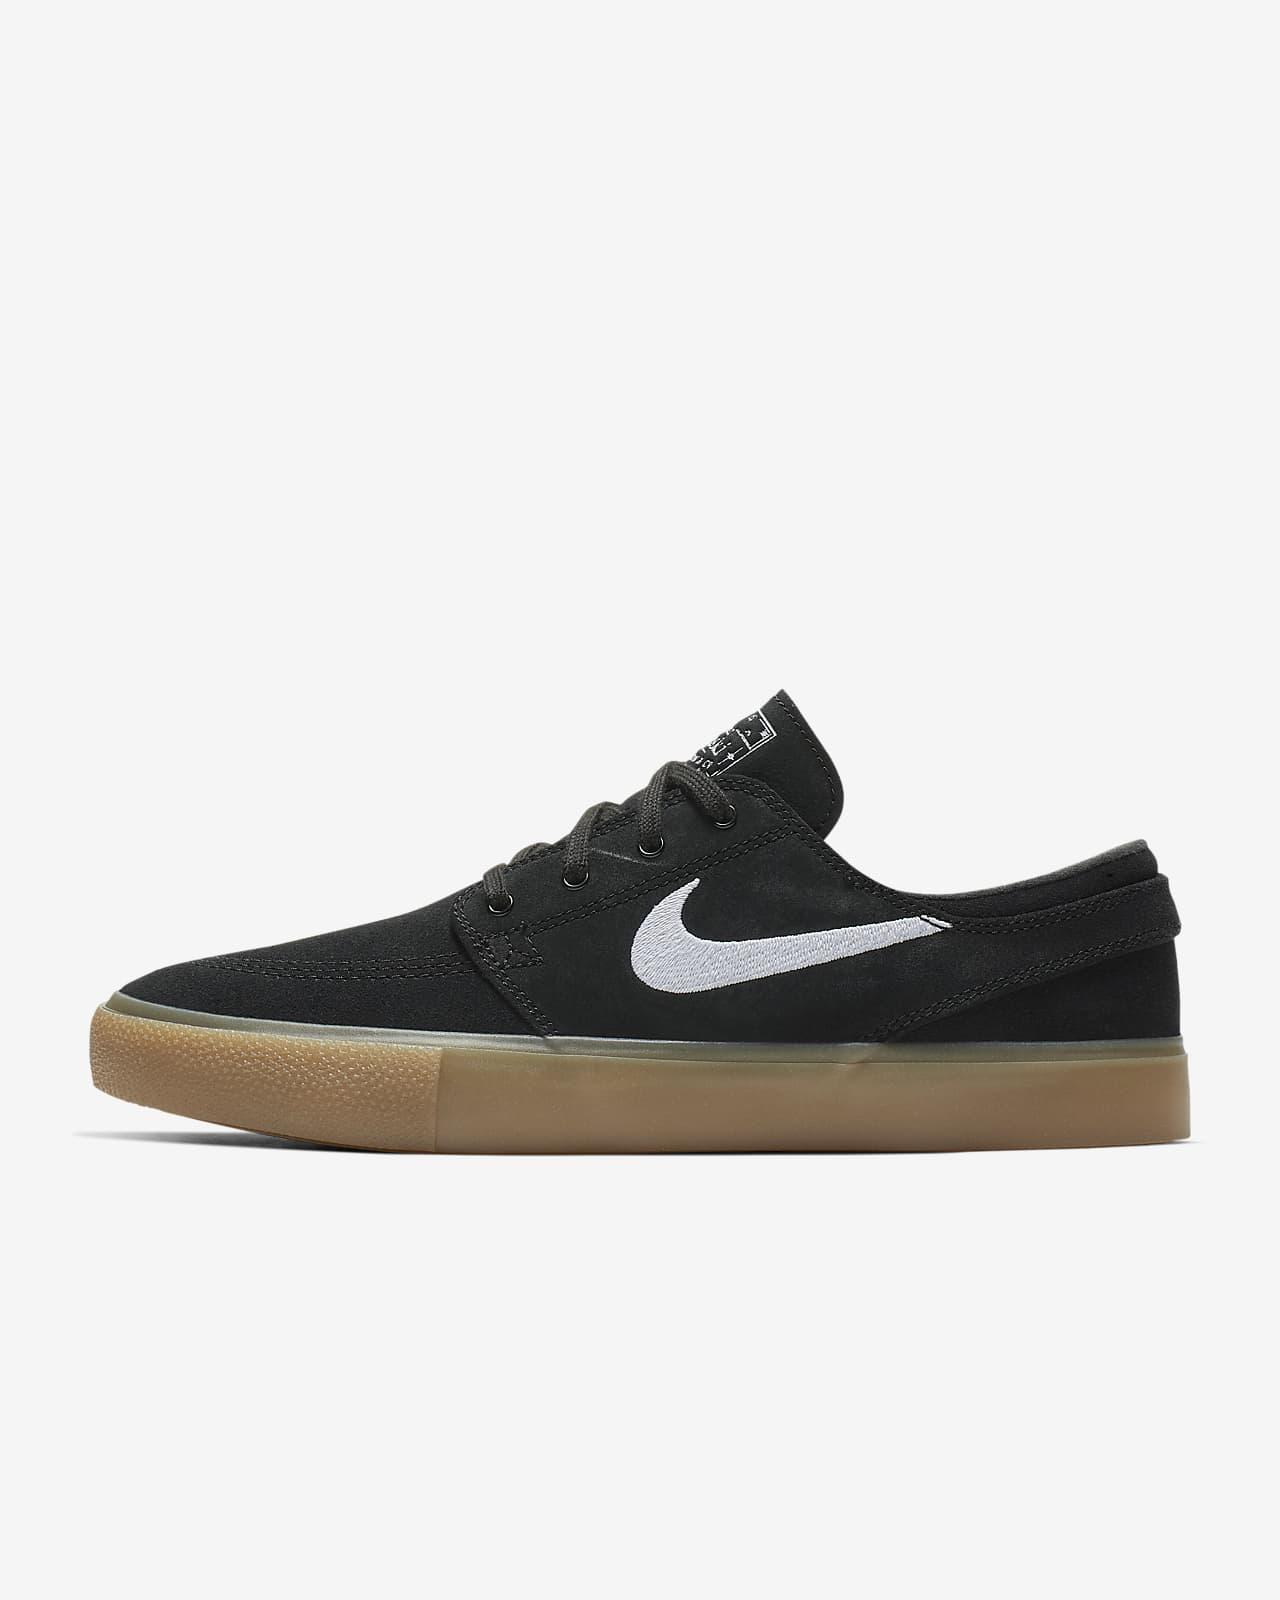 Nike SB Zoom Stefan Janoski RM Skate Shoe